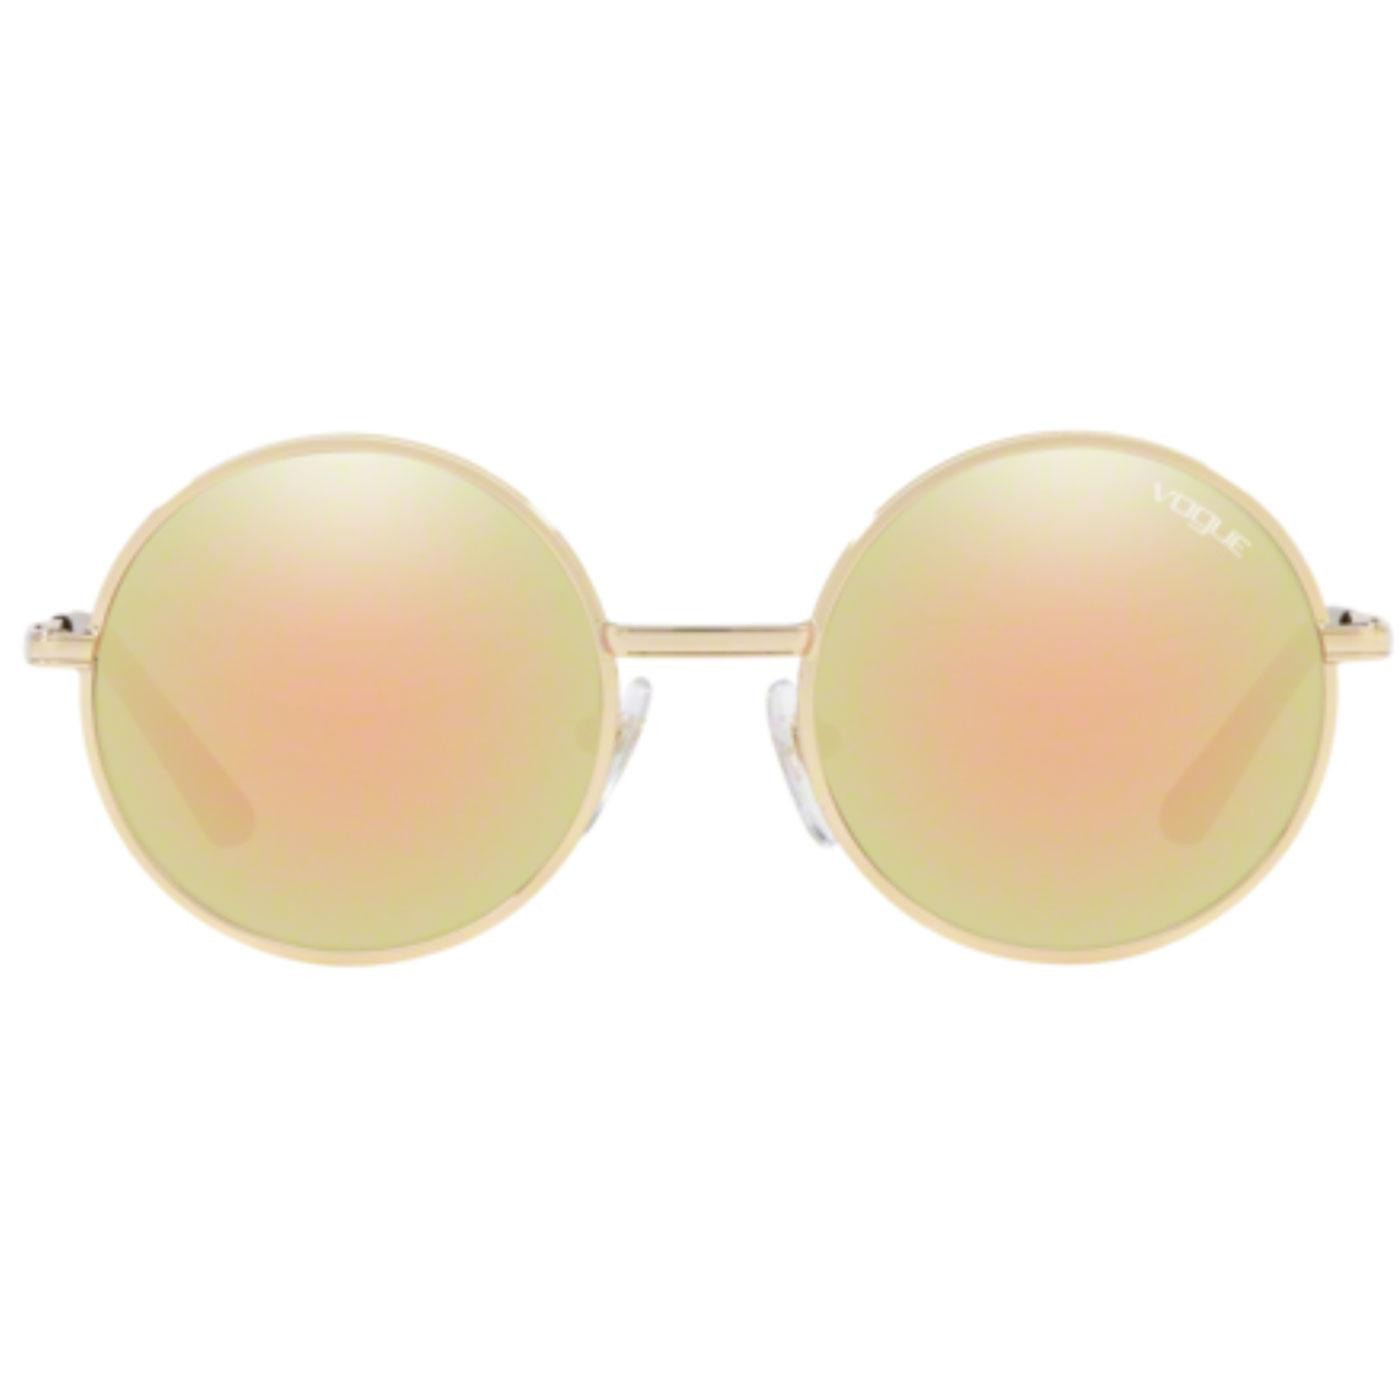 VOGUE x GIGI HADID Retro 60s Round Sunglasses GM